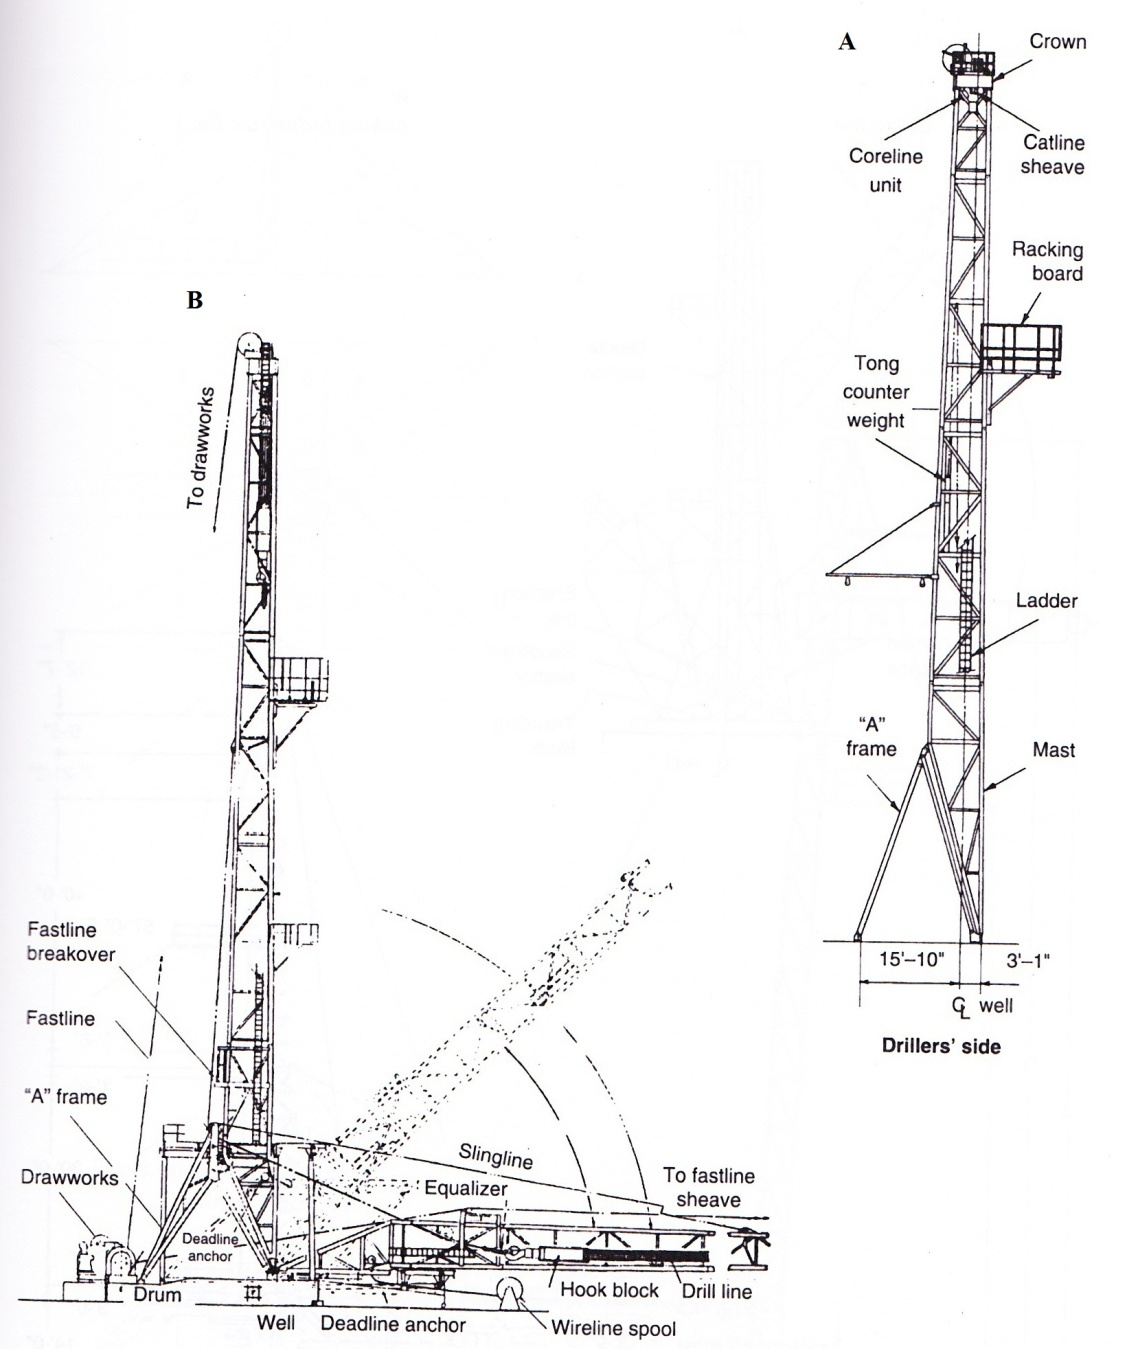 mast rigging diagram loncin mini chopper wiring theory